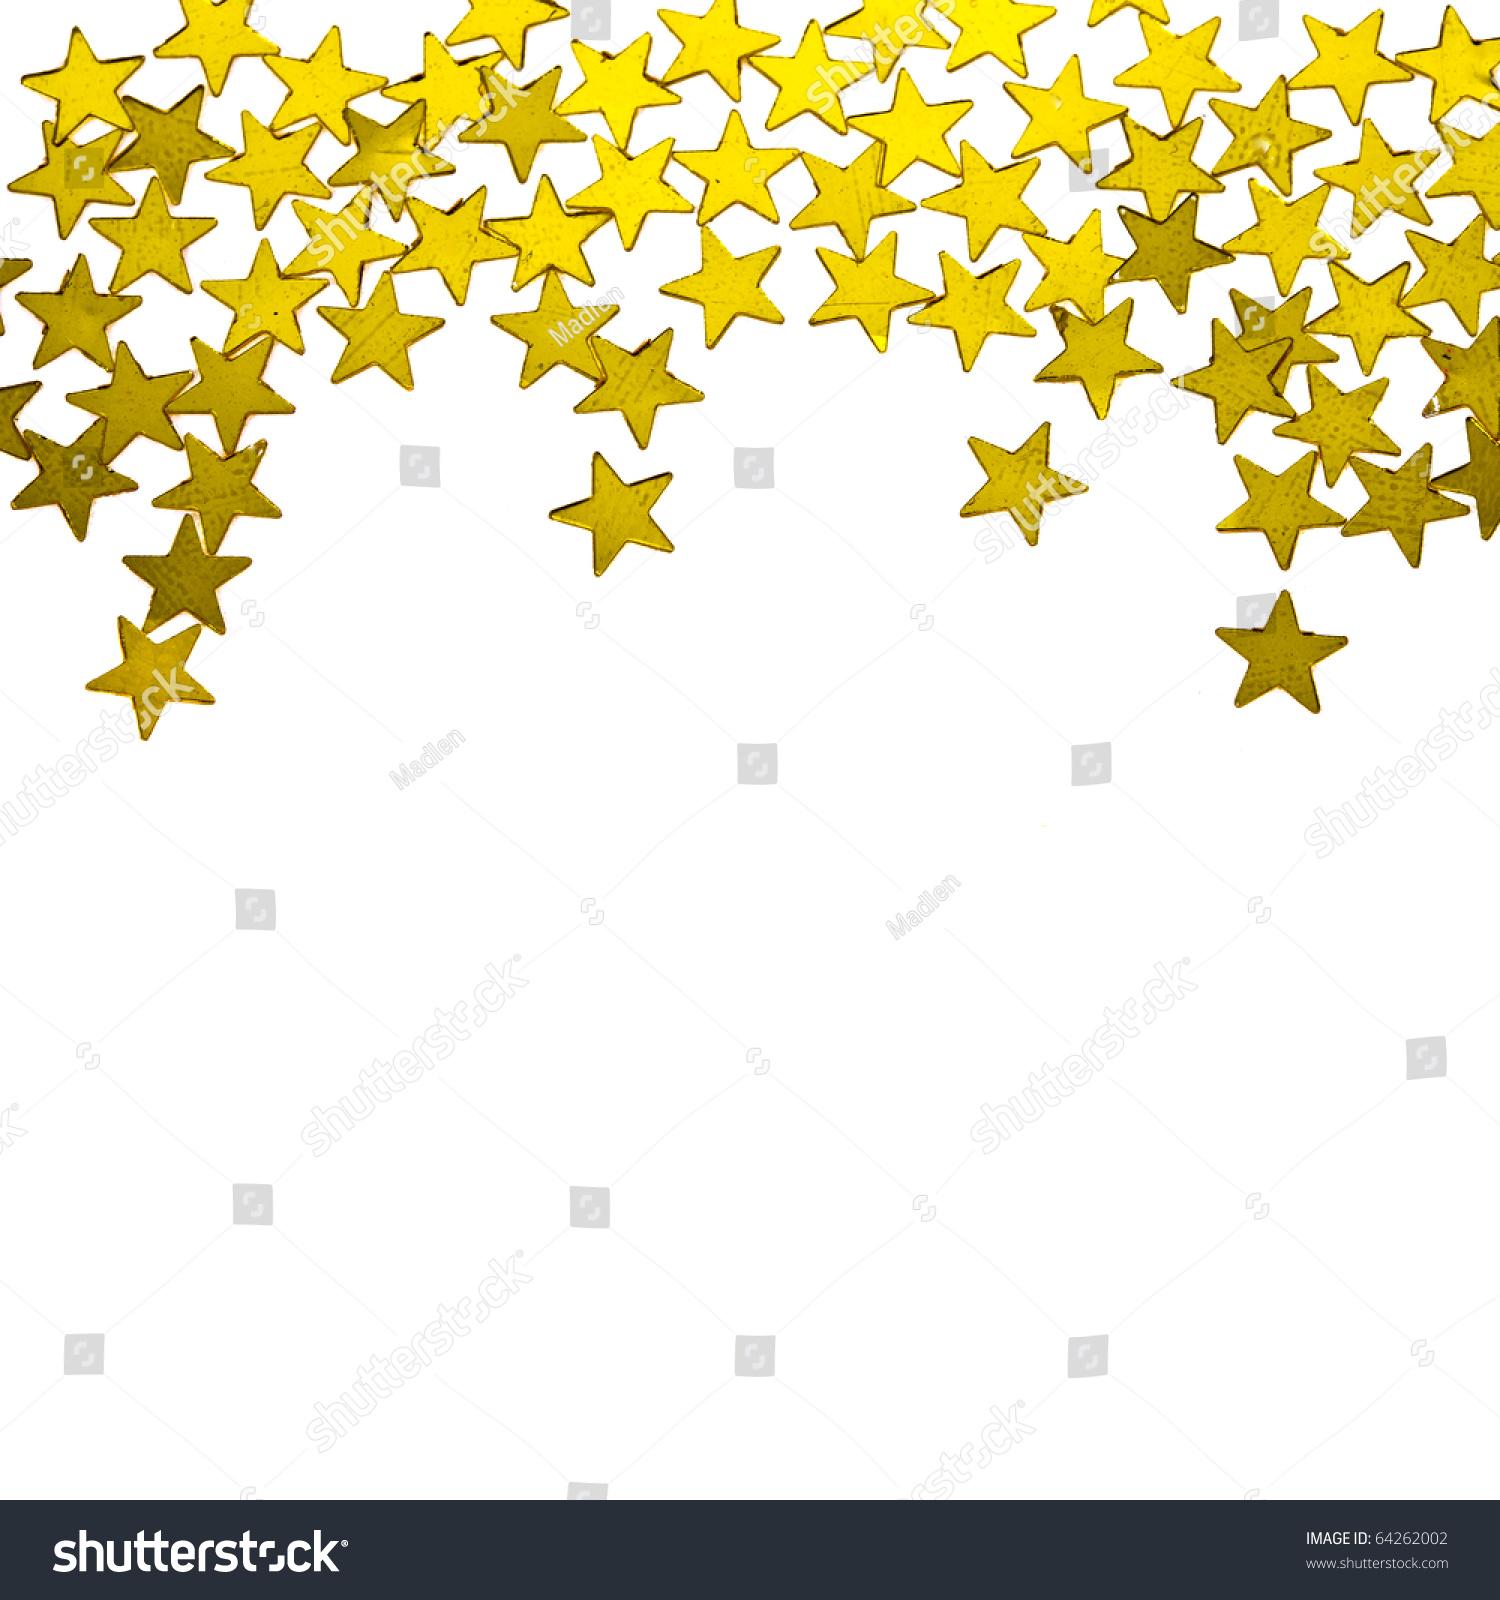 Gold star ornaments - Golden Stars Ornaments On White Background